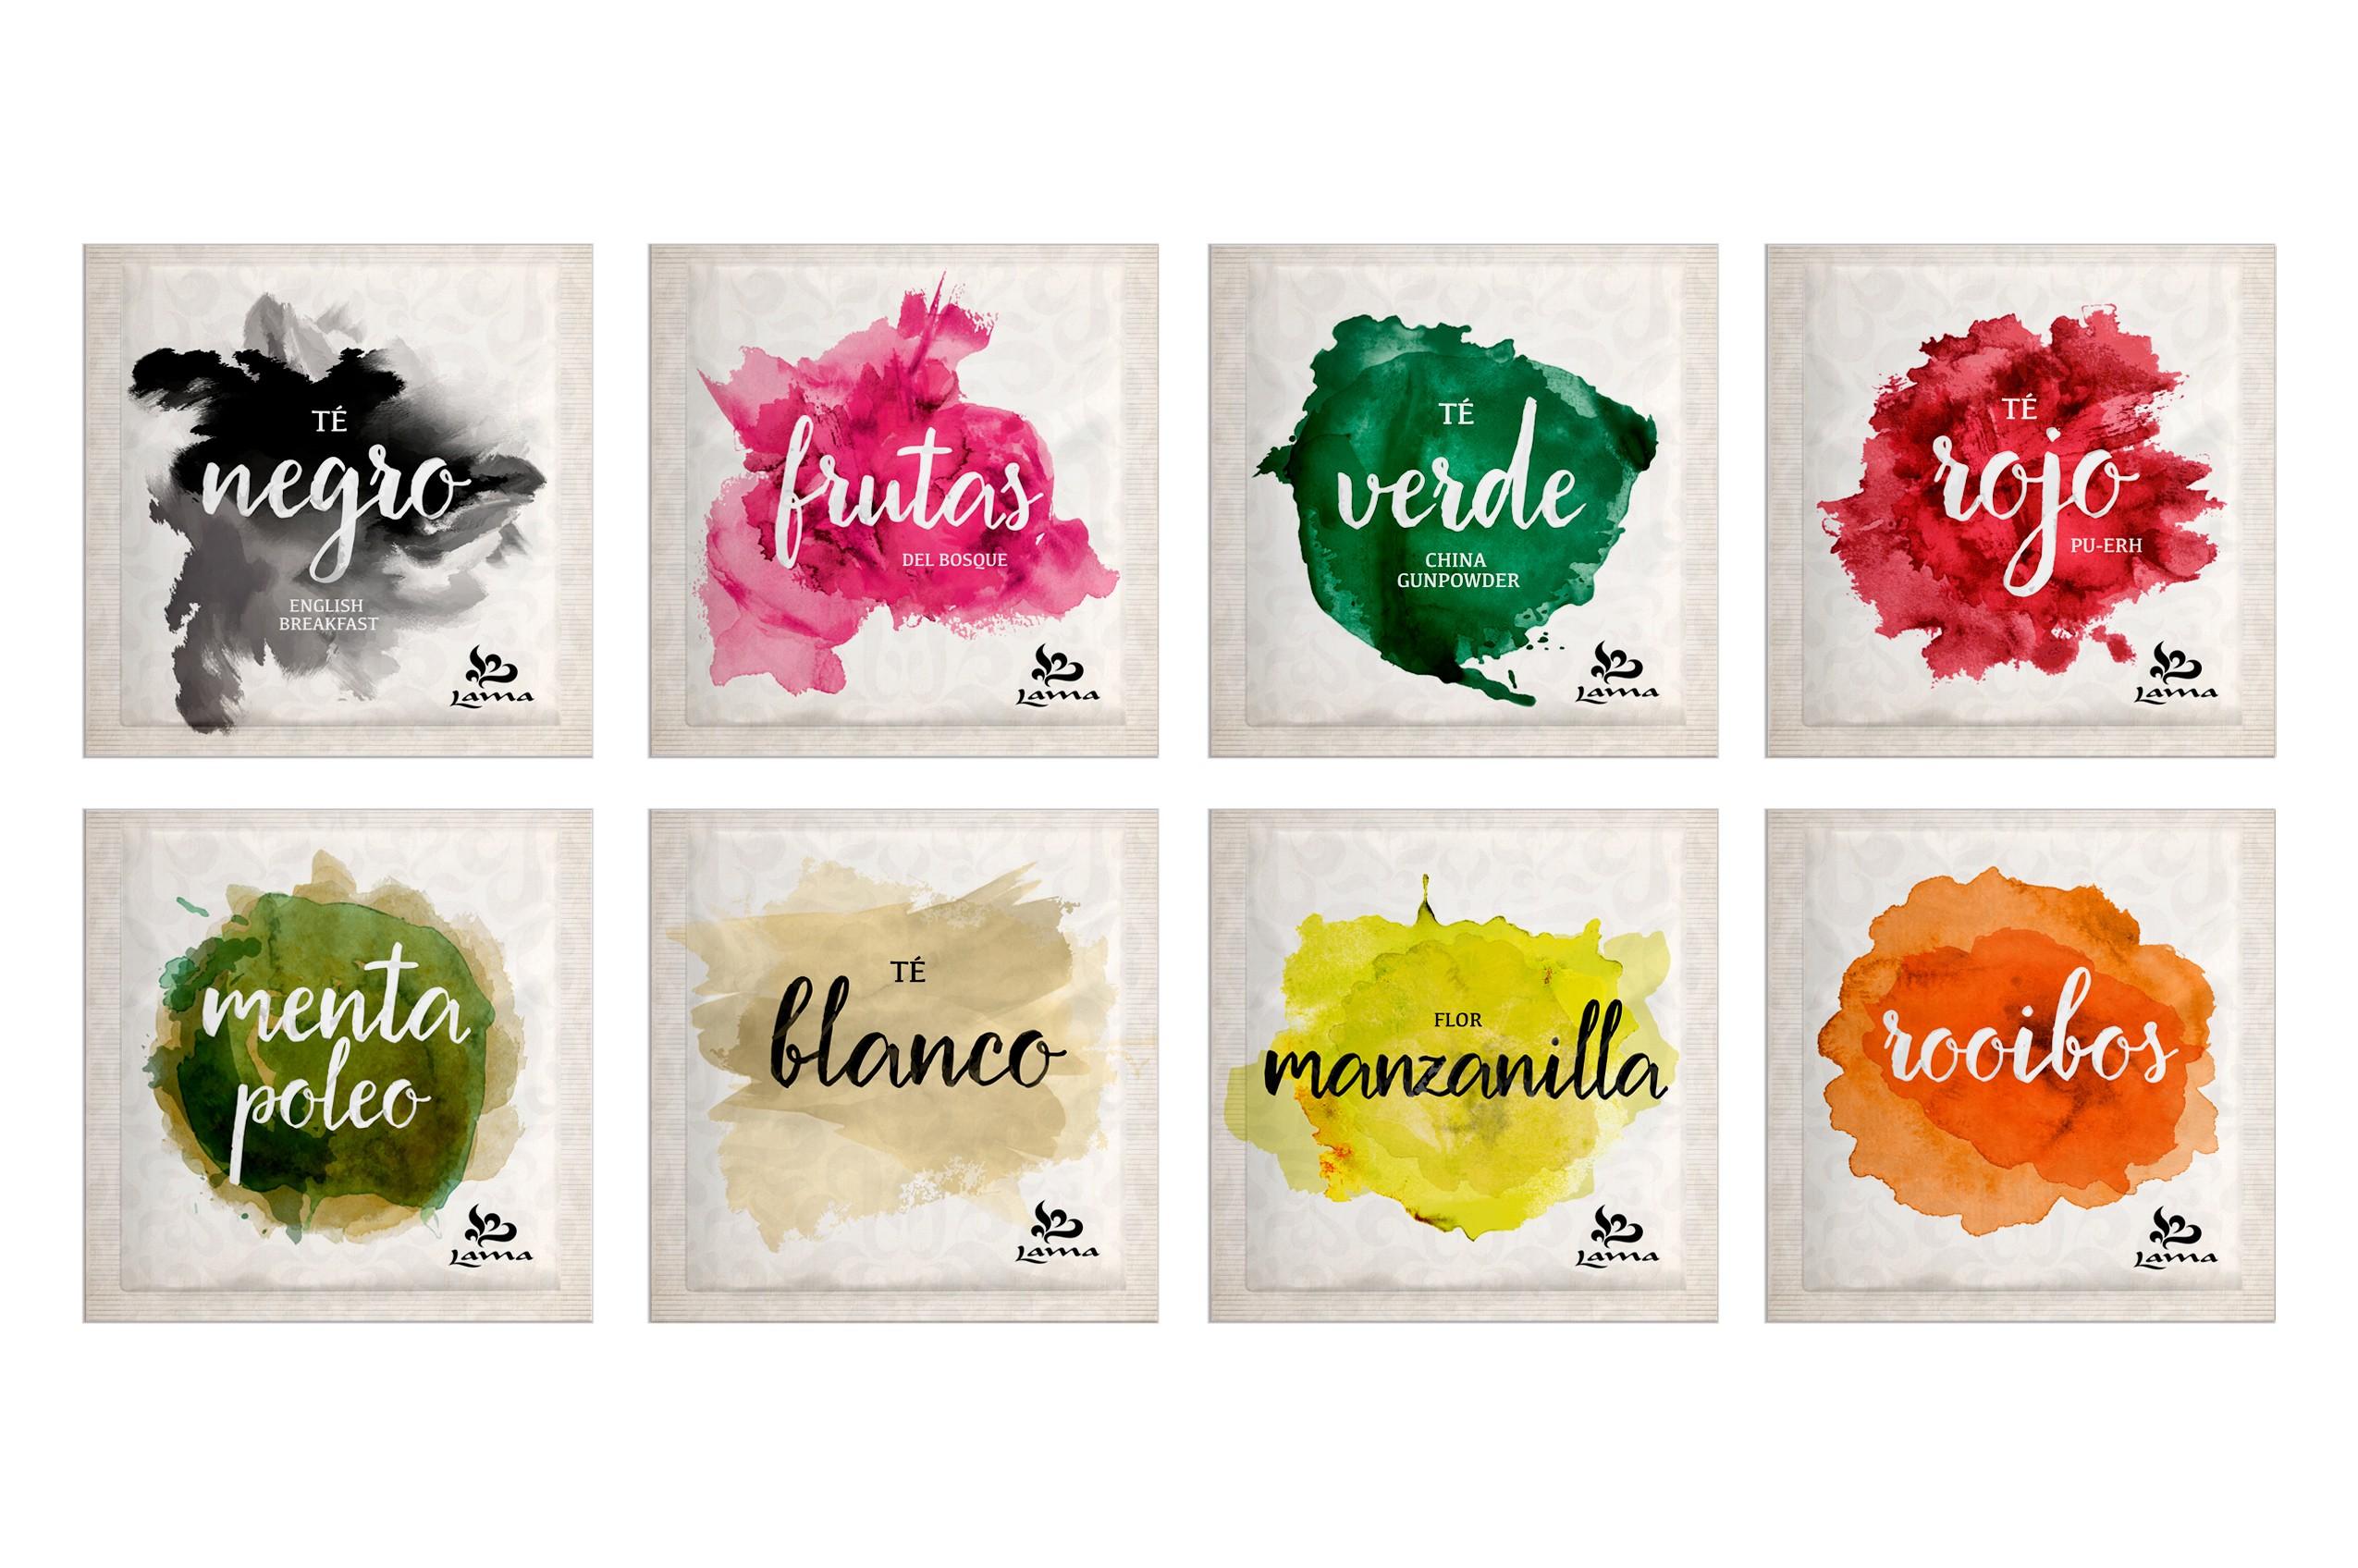 Diana Casado - Packaging